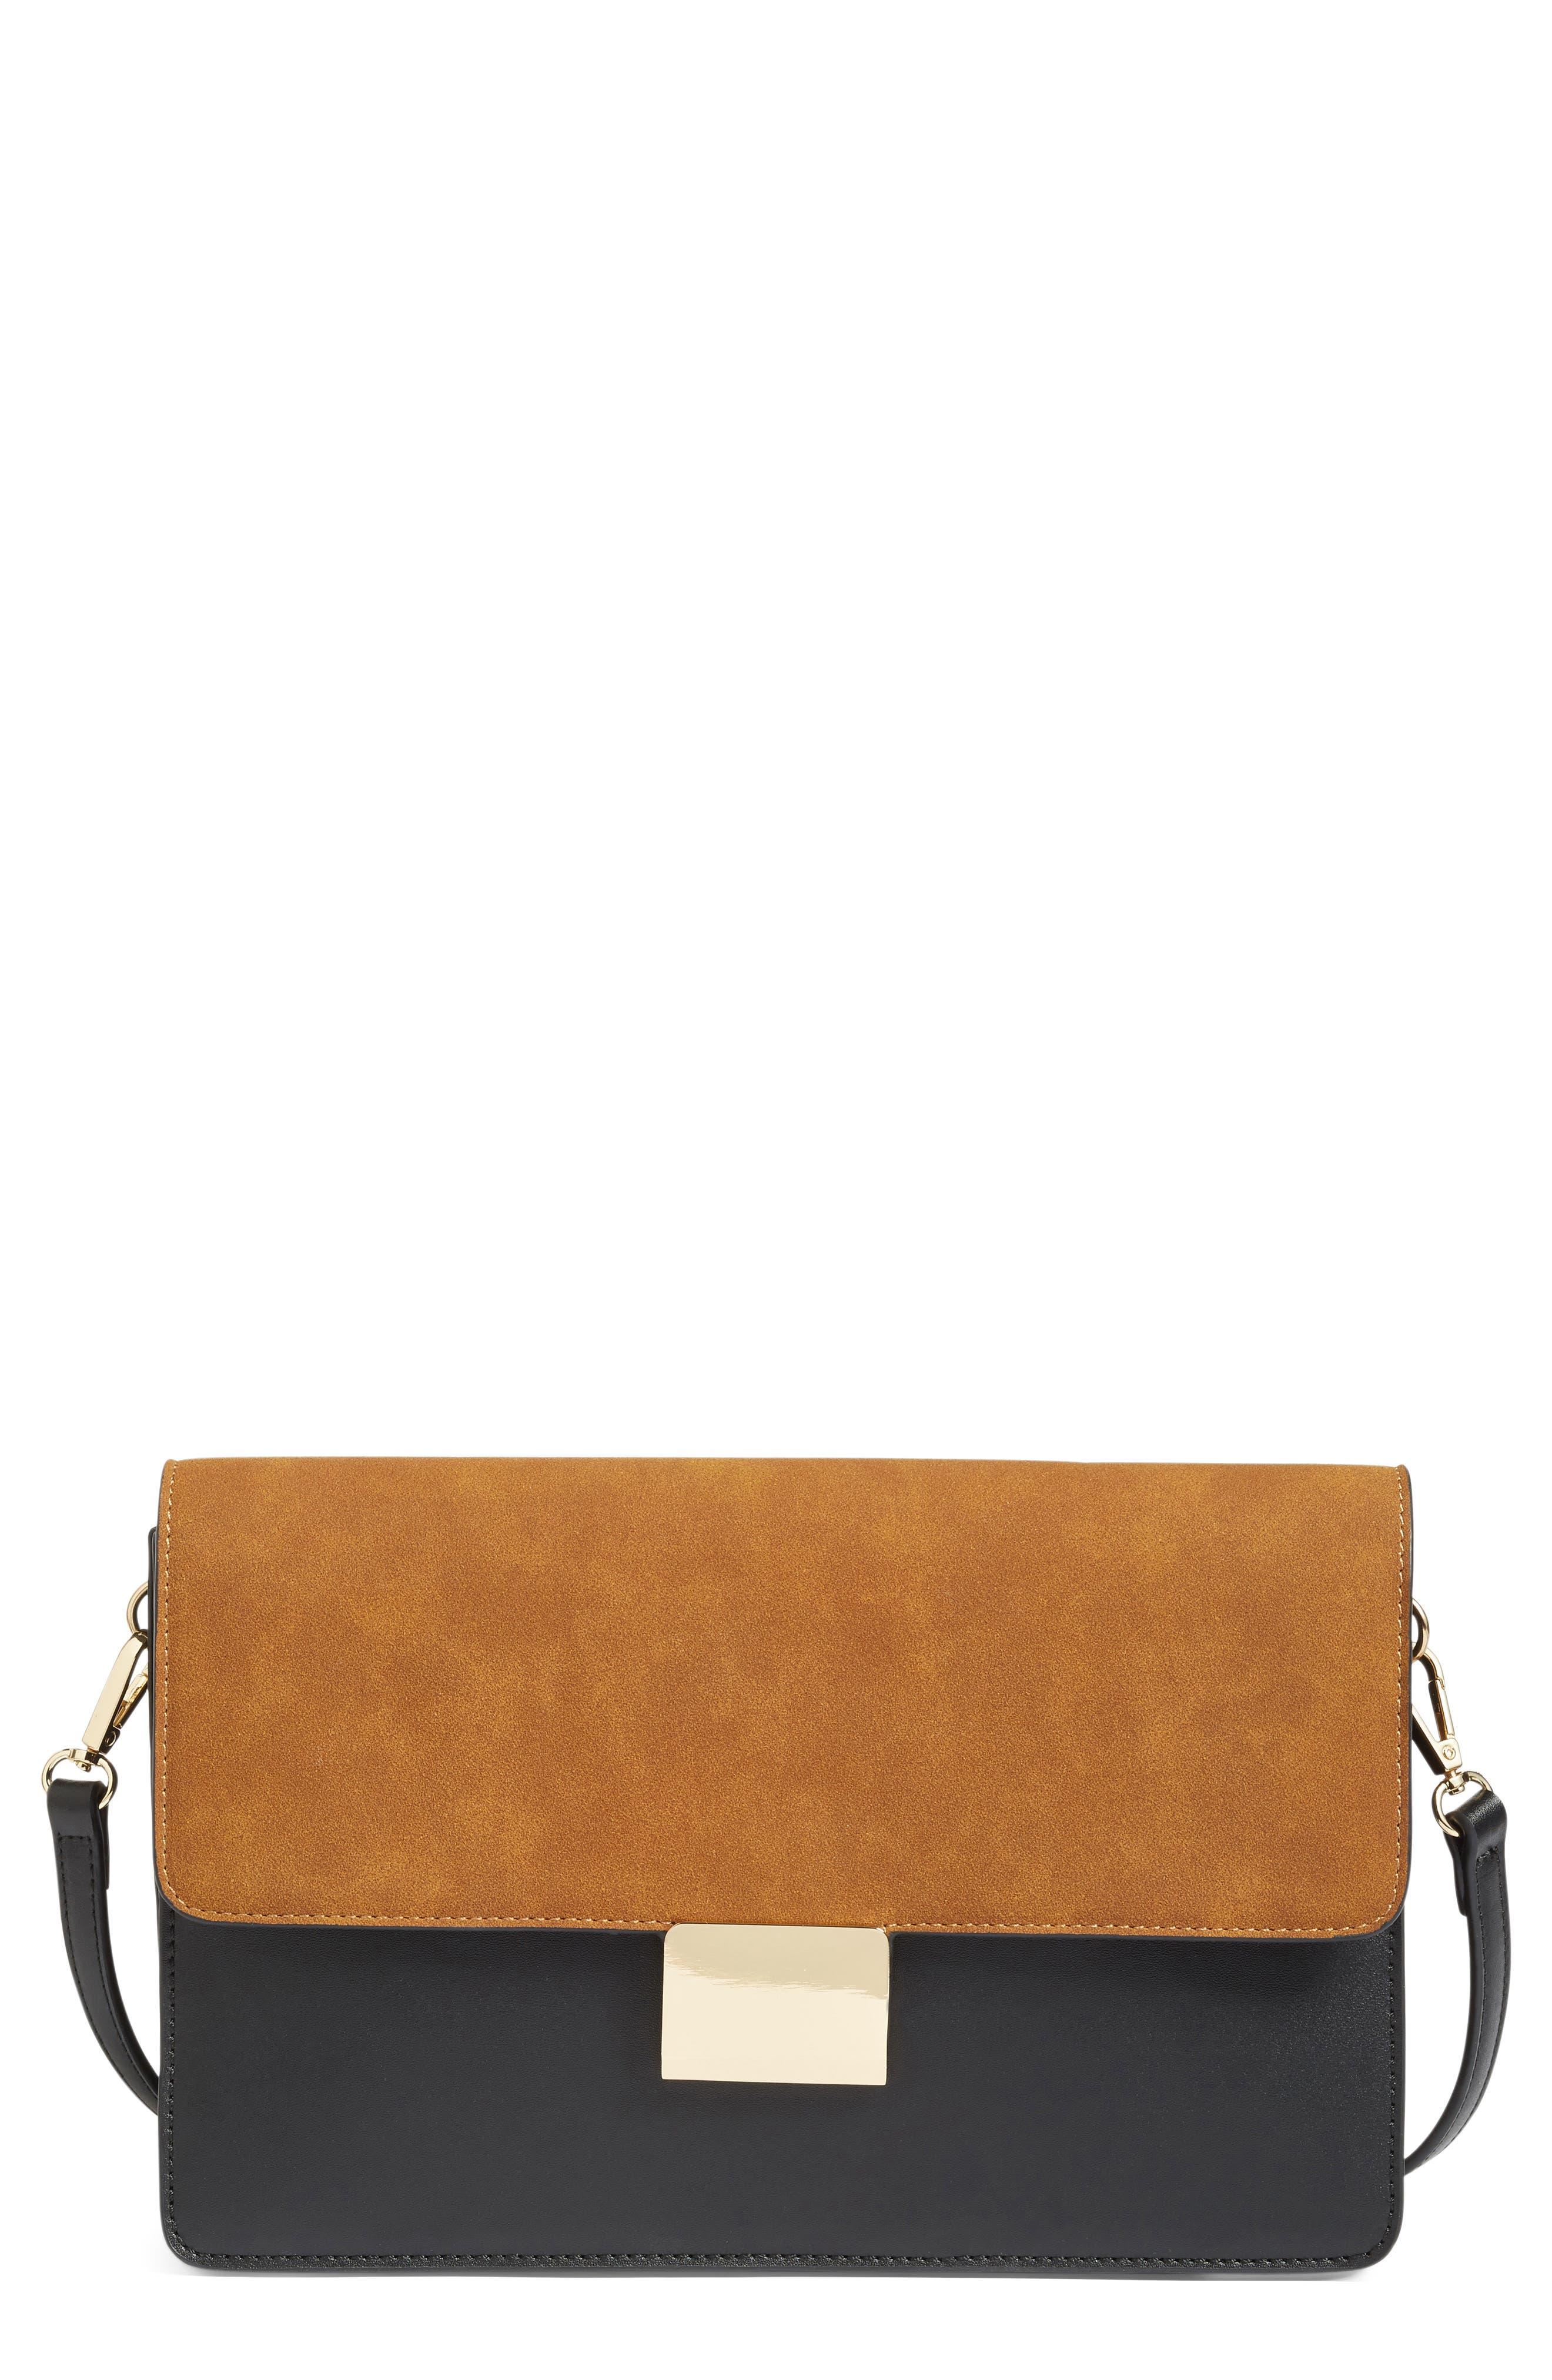 Chelsea28 Leighton Colorblock Faux Leather Crossbody Bag